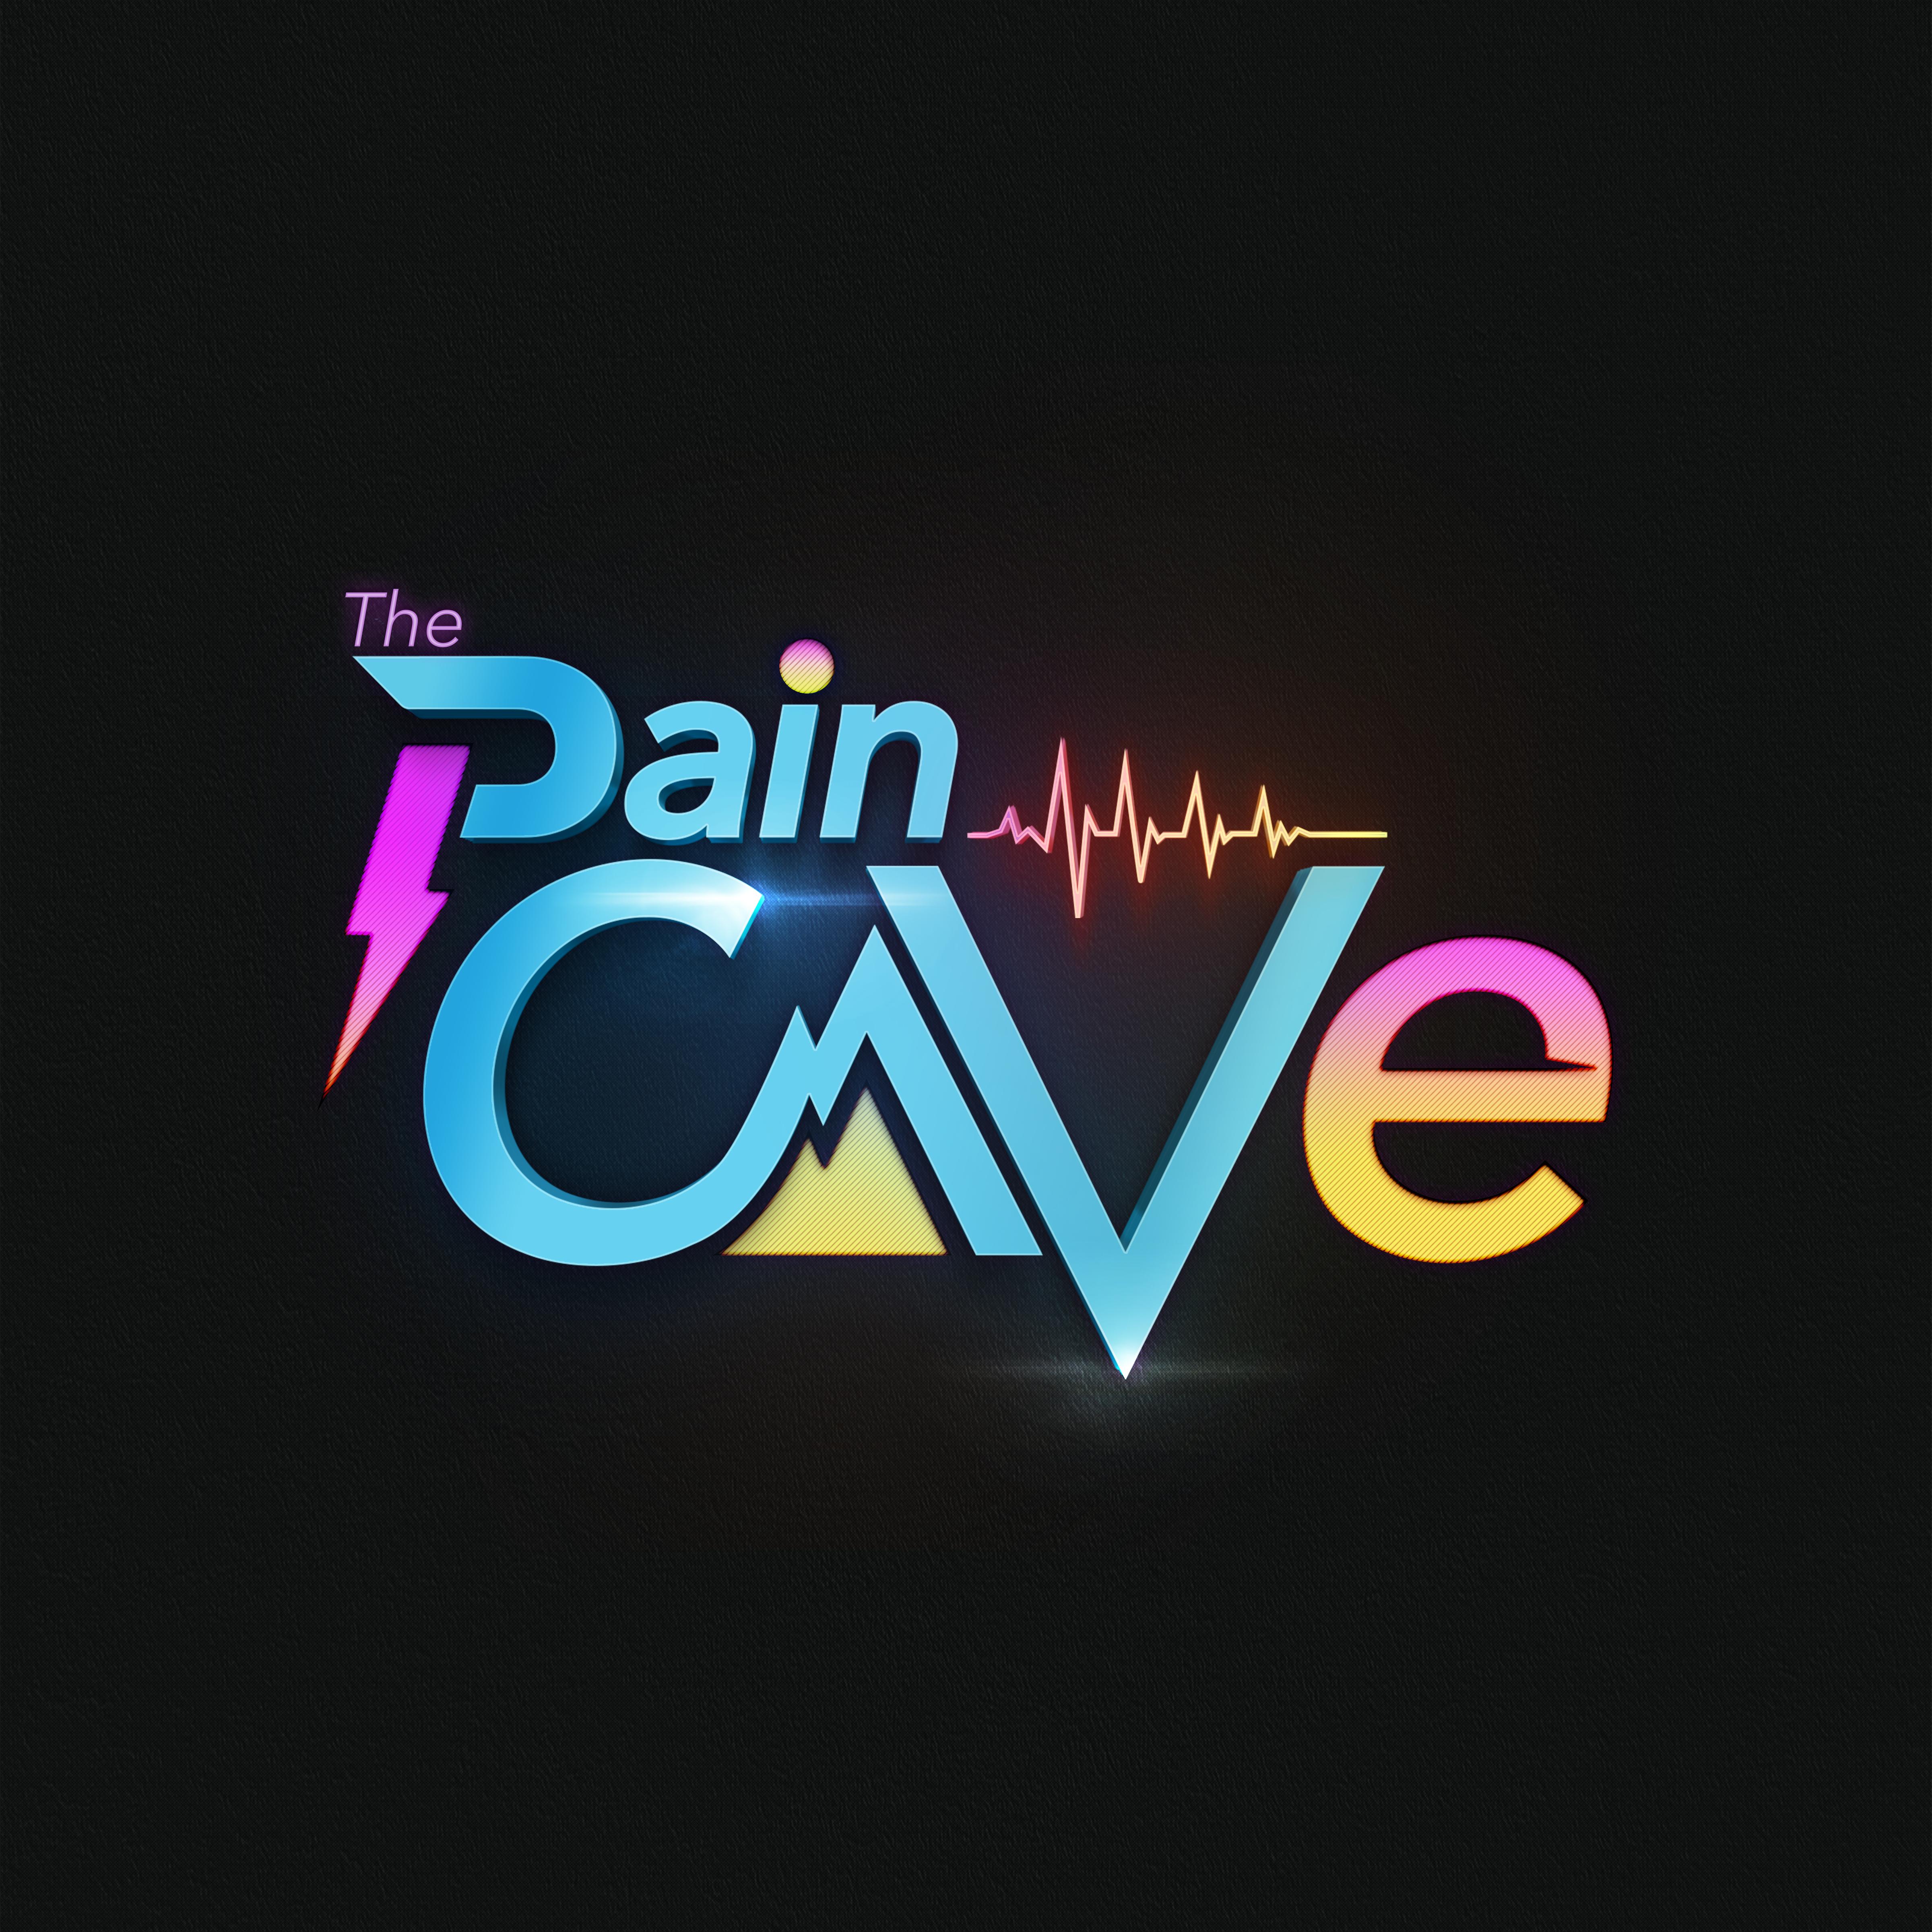 pain cave logo-16x16